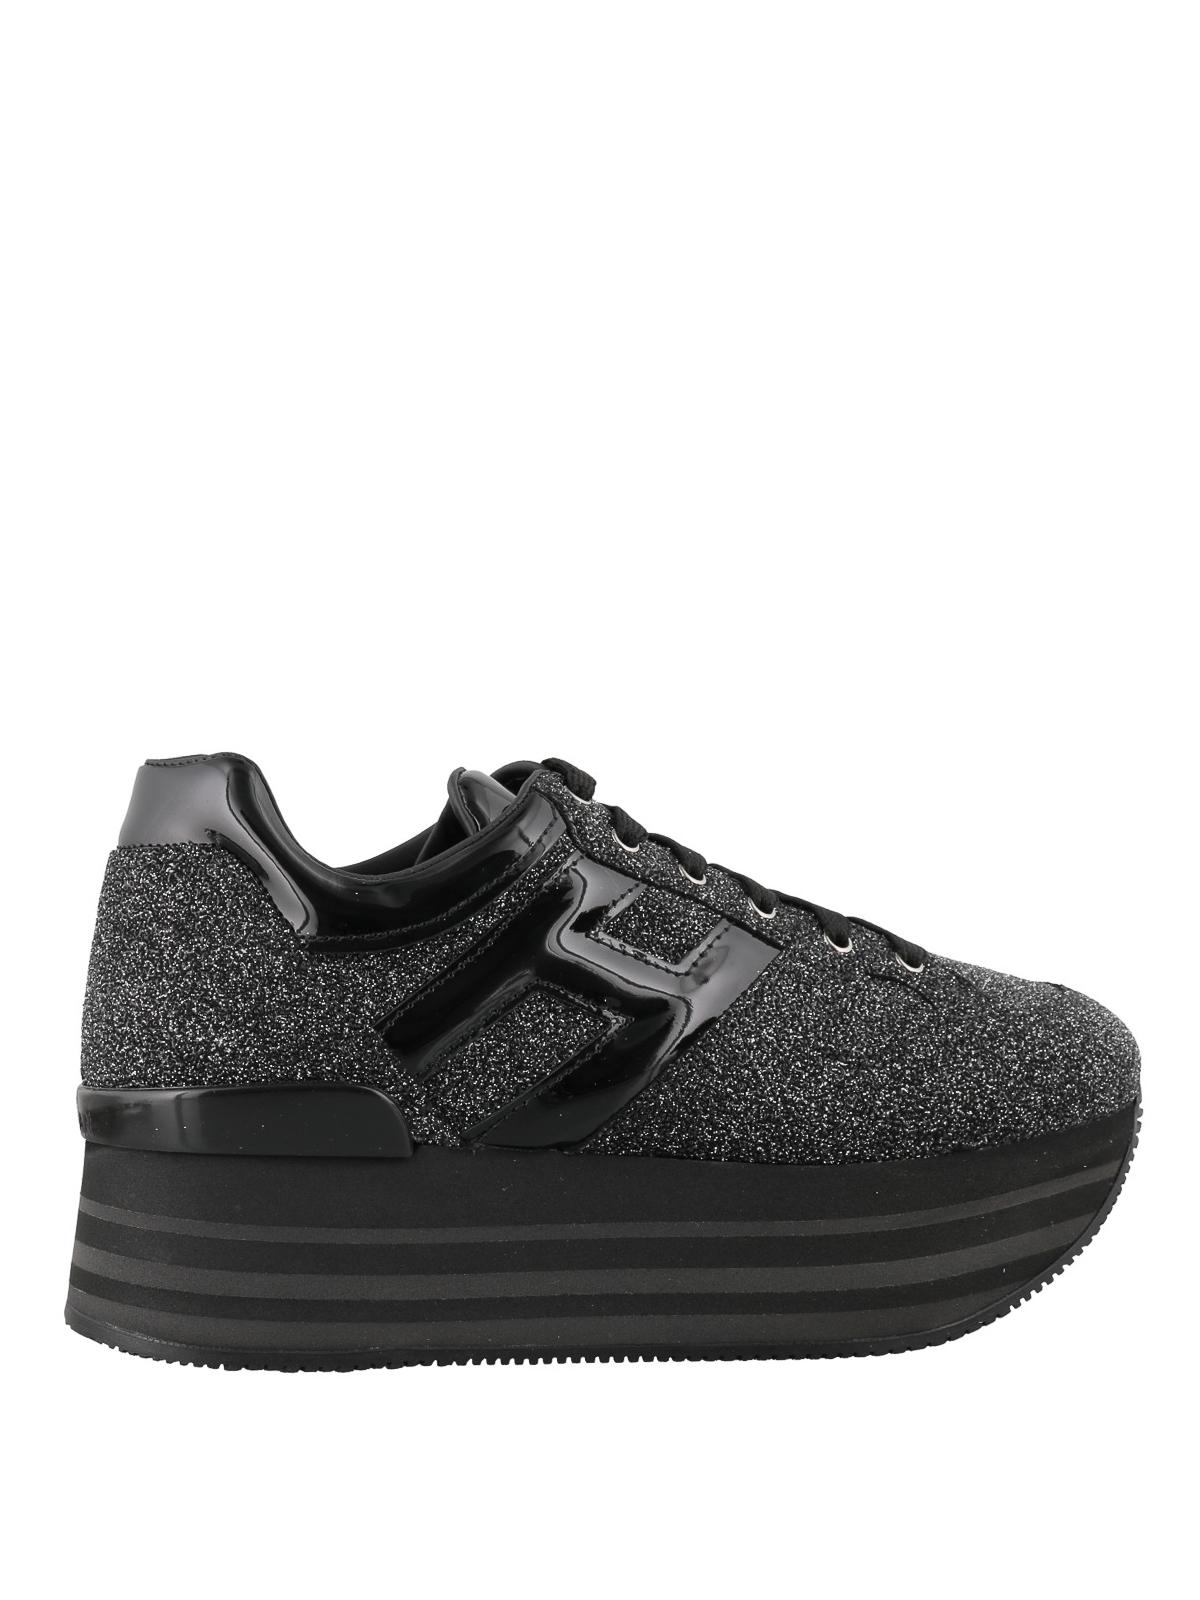 Hogan - Maxi H222 glitter sneakers - trainers - HXW2830T548LNY0ZHC